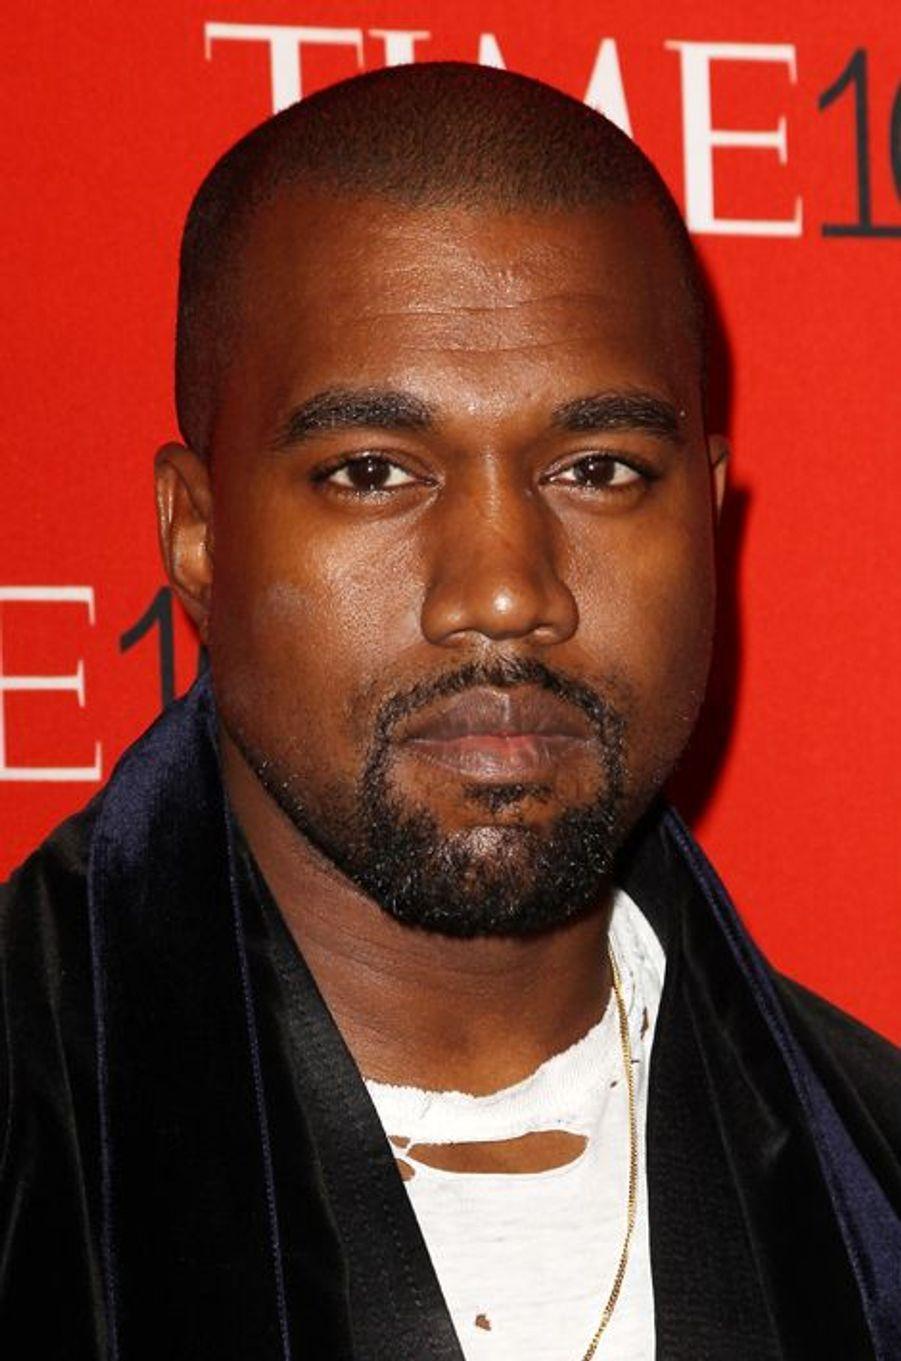 Kanye West à New York le 21 avril 2015